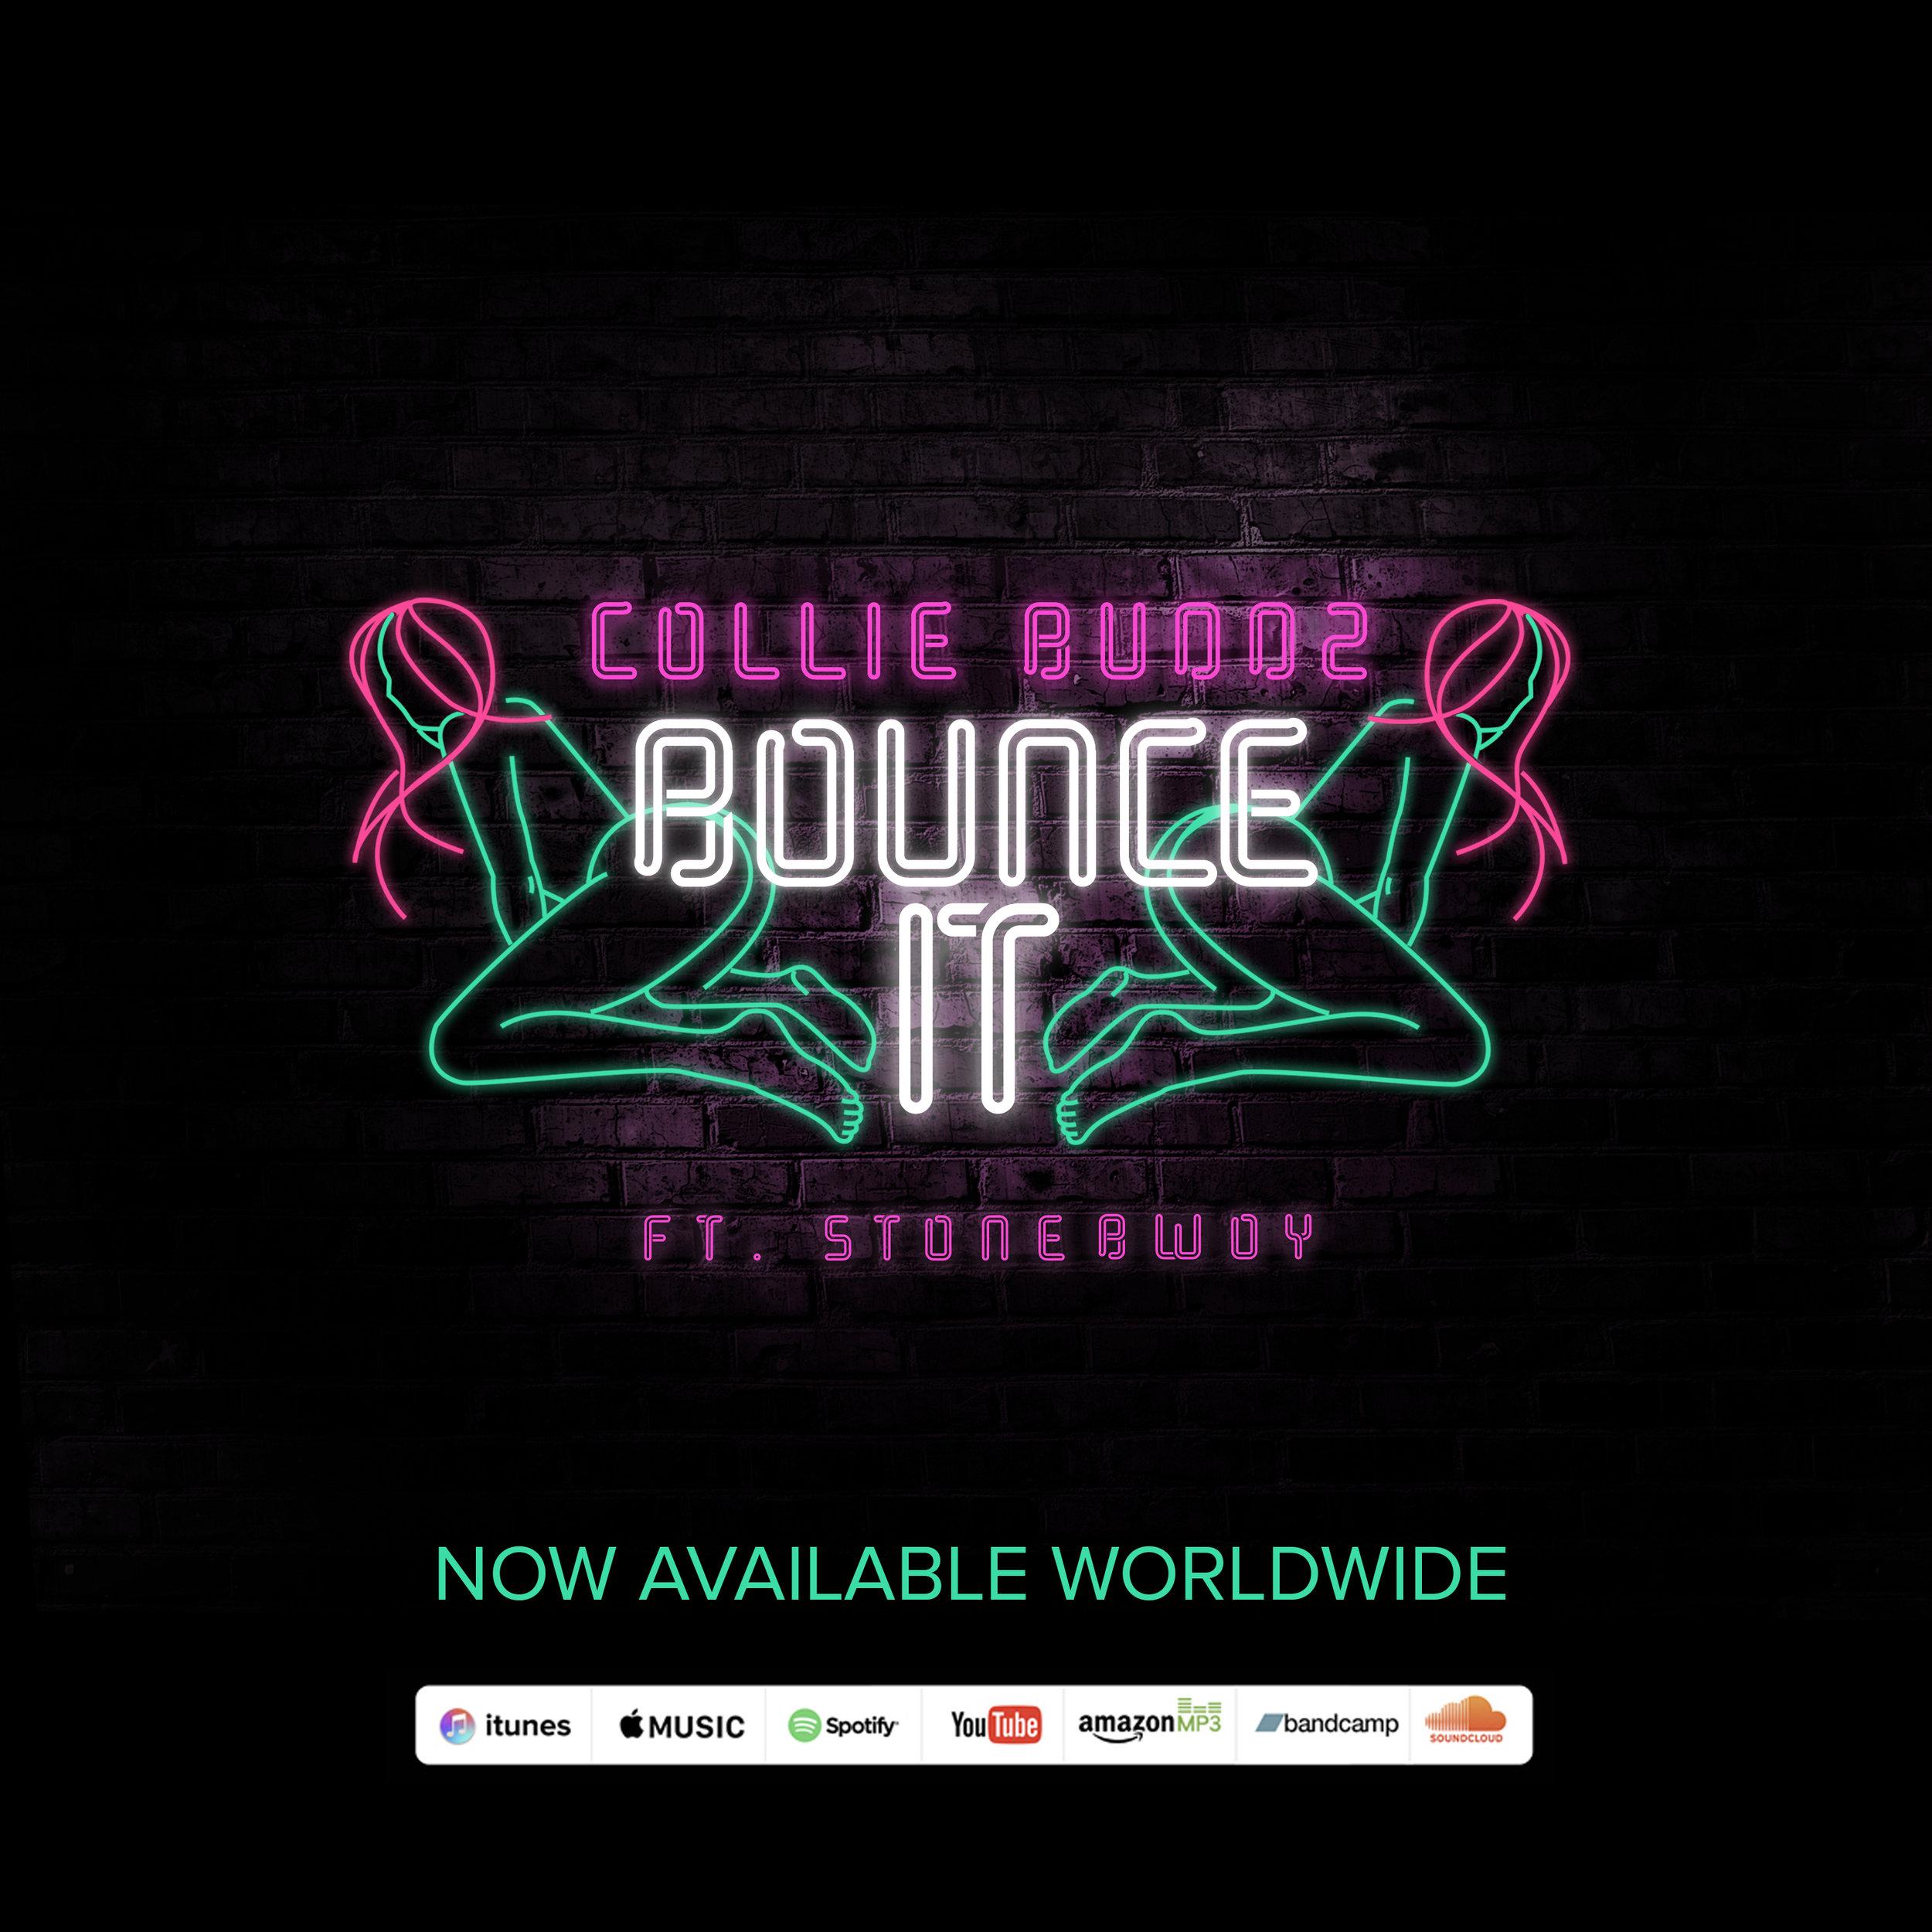 bounceit_IG_now_available.jpg